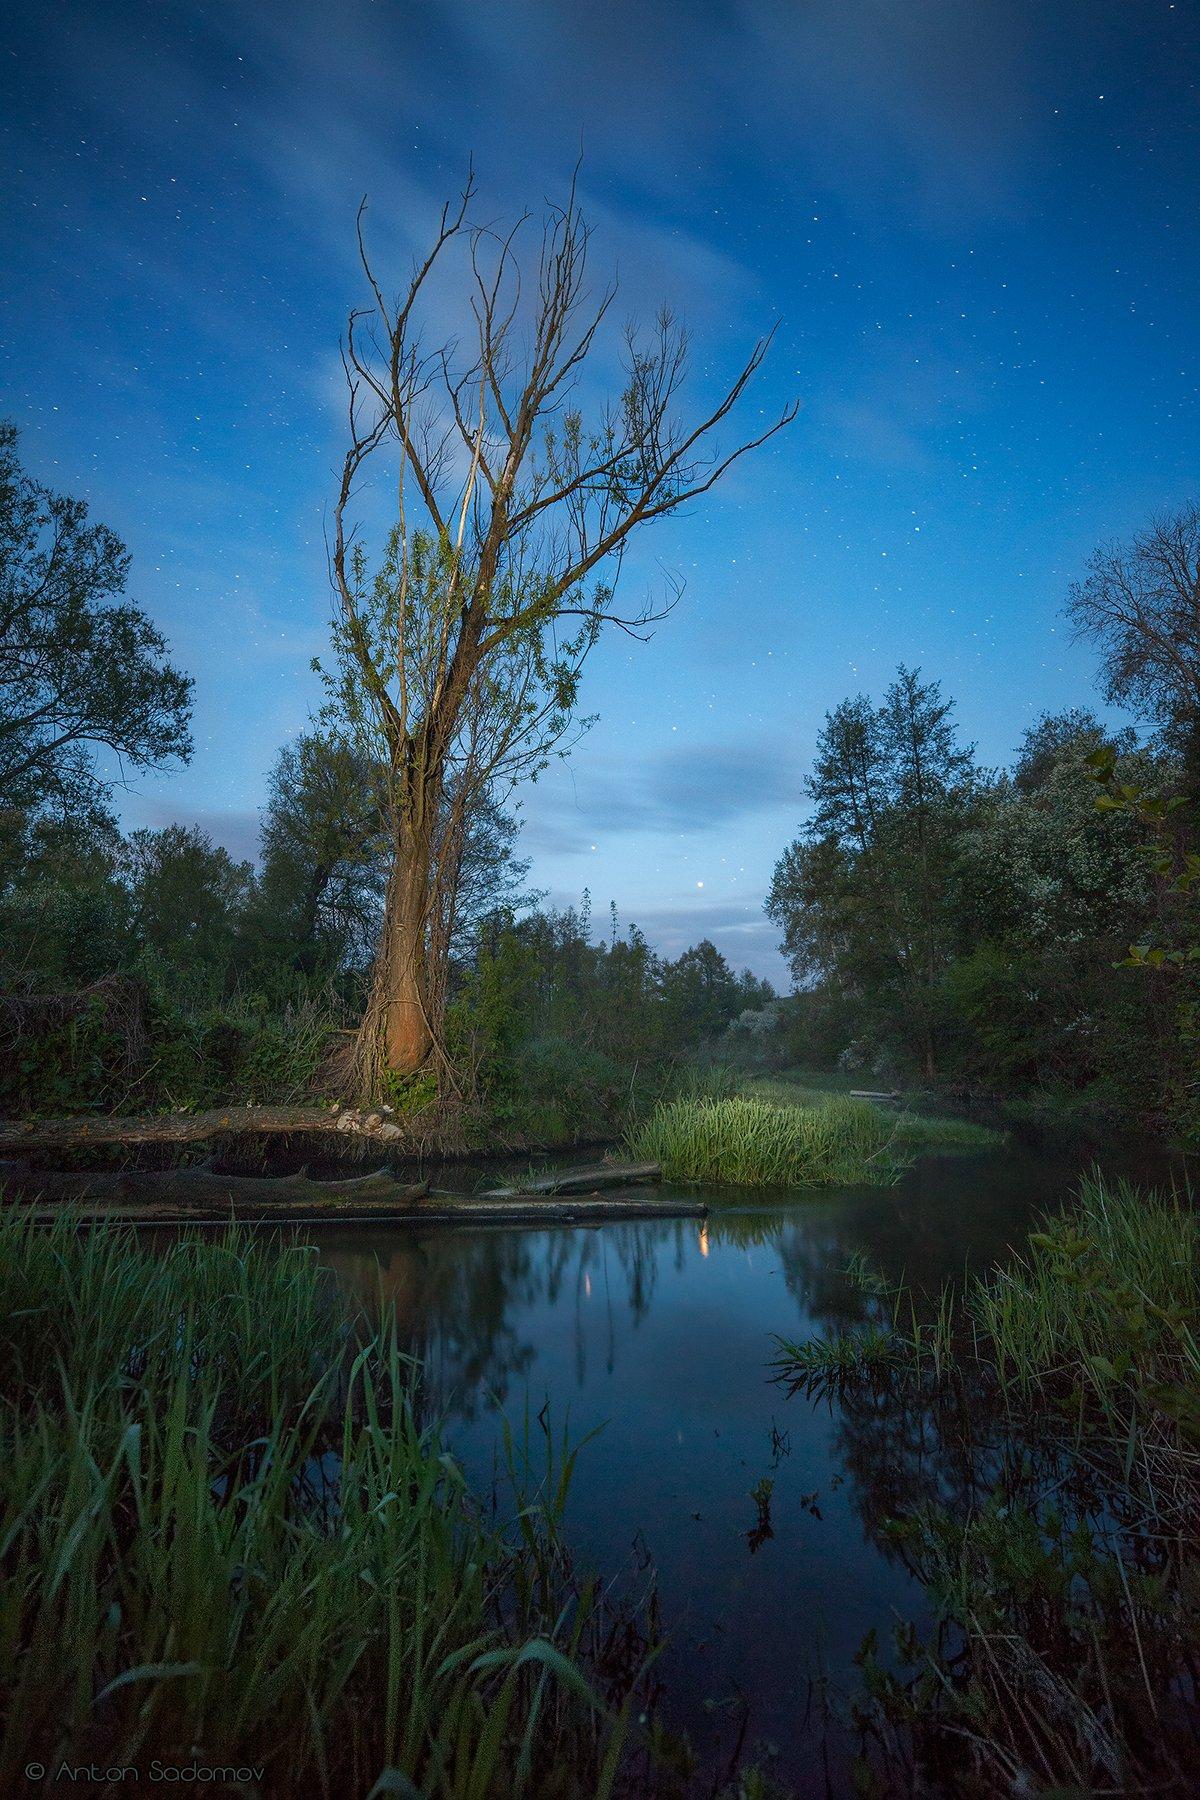 пейзаж, ночь, лес, река, вода, дерево, татищево, идолга, Антон Садомов